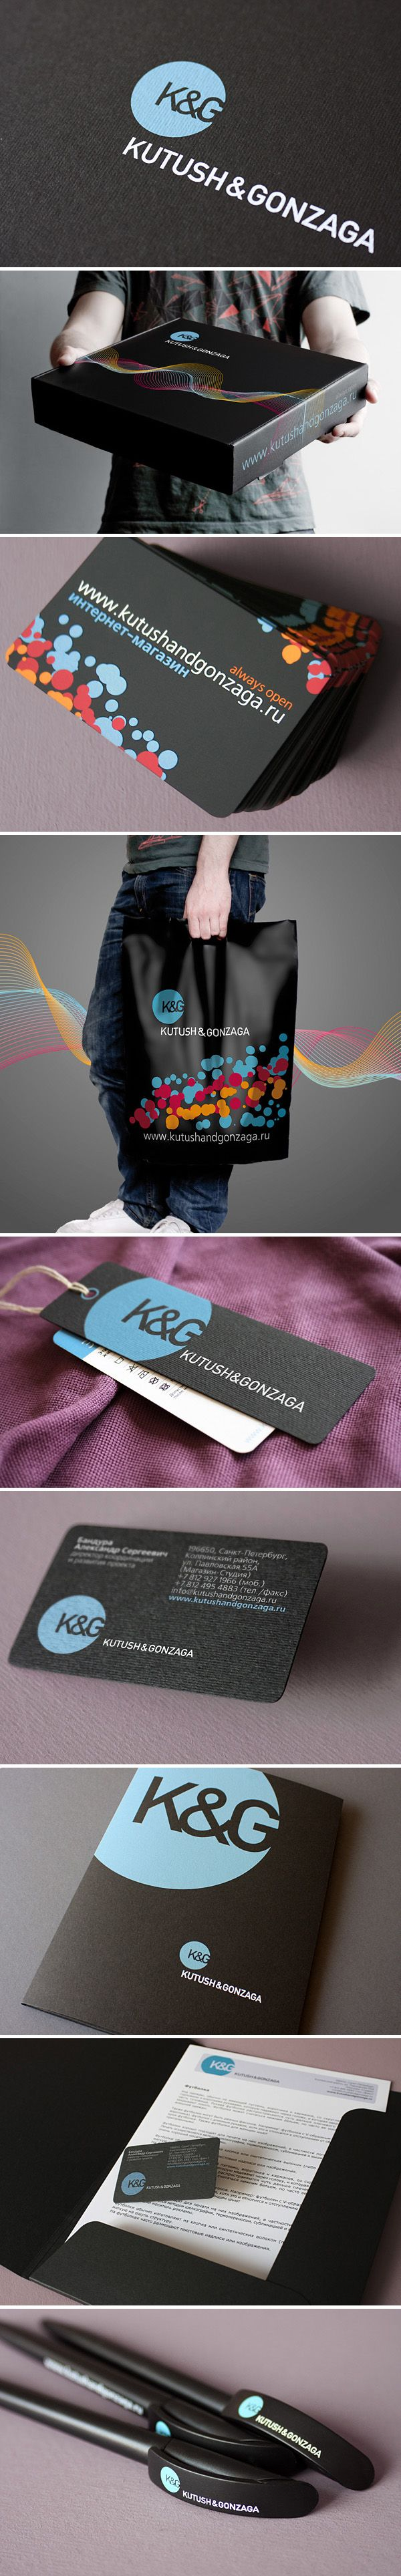 Logo and Brand Identity K&G Store. Логотип и фирменный стиль студии молодежной одежды Kutush & Gonzaga